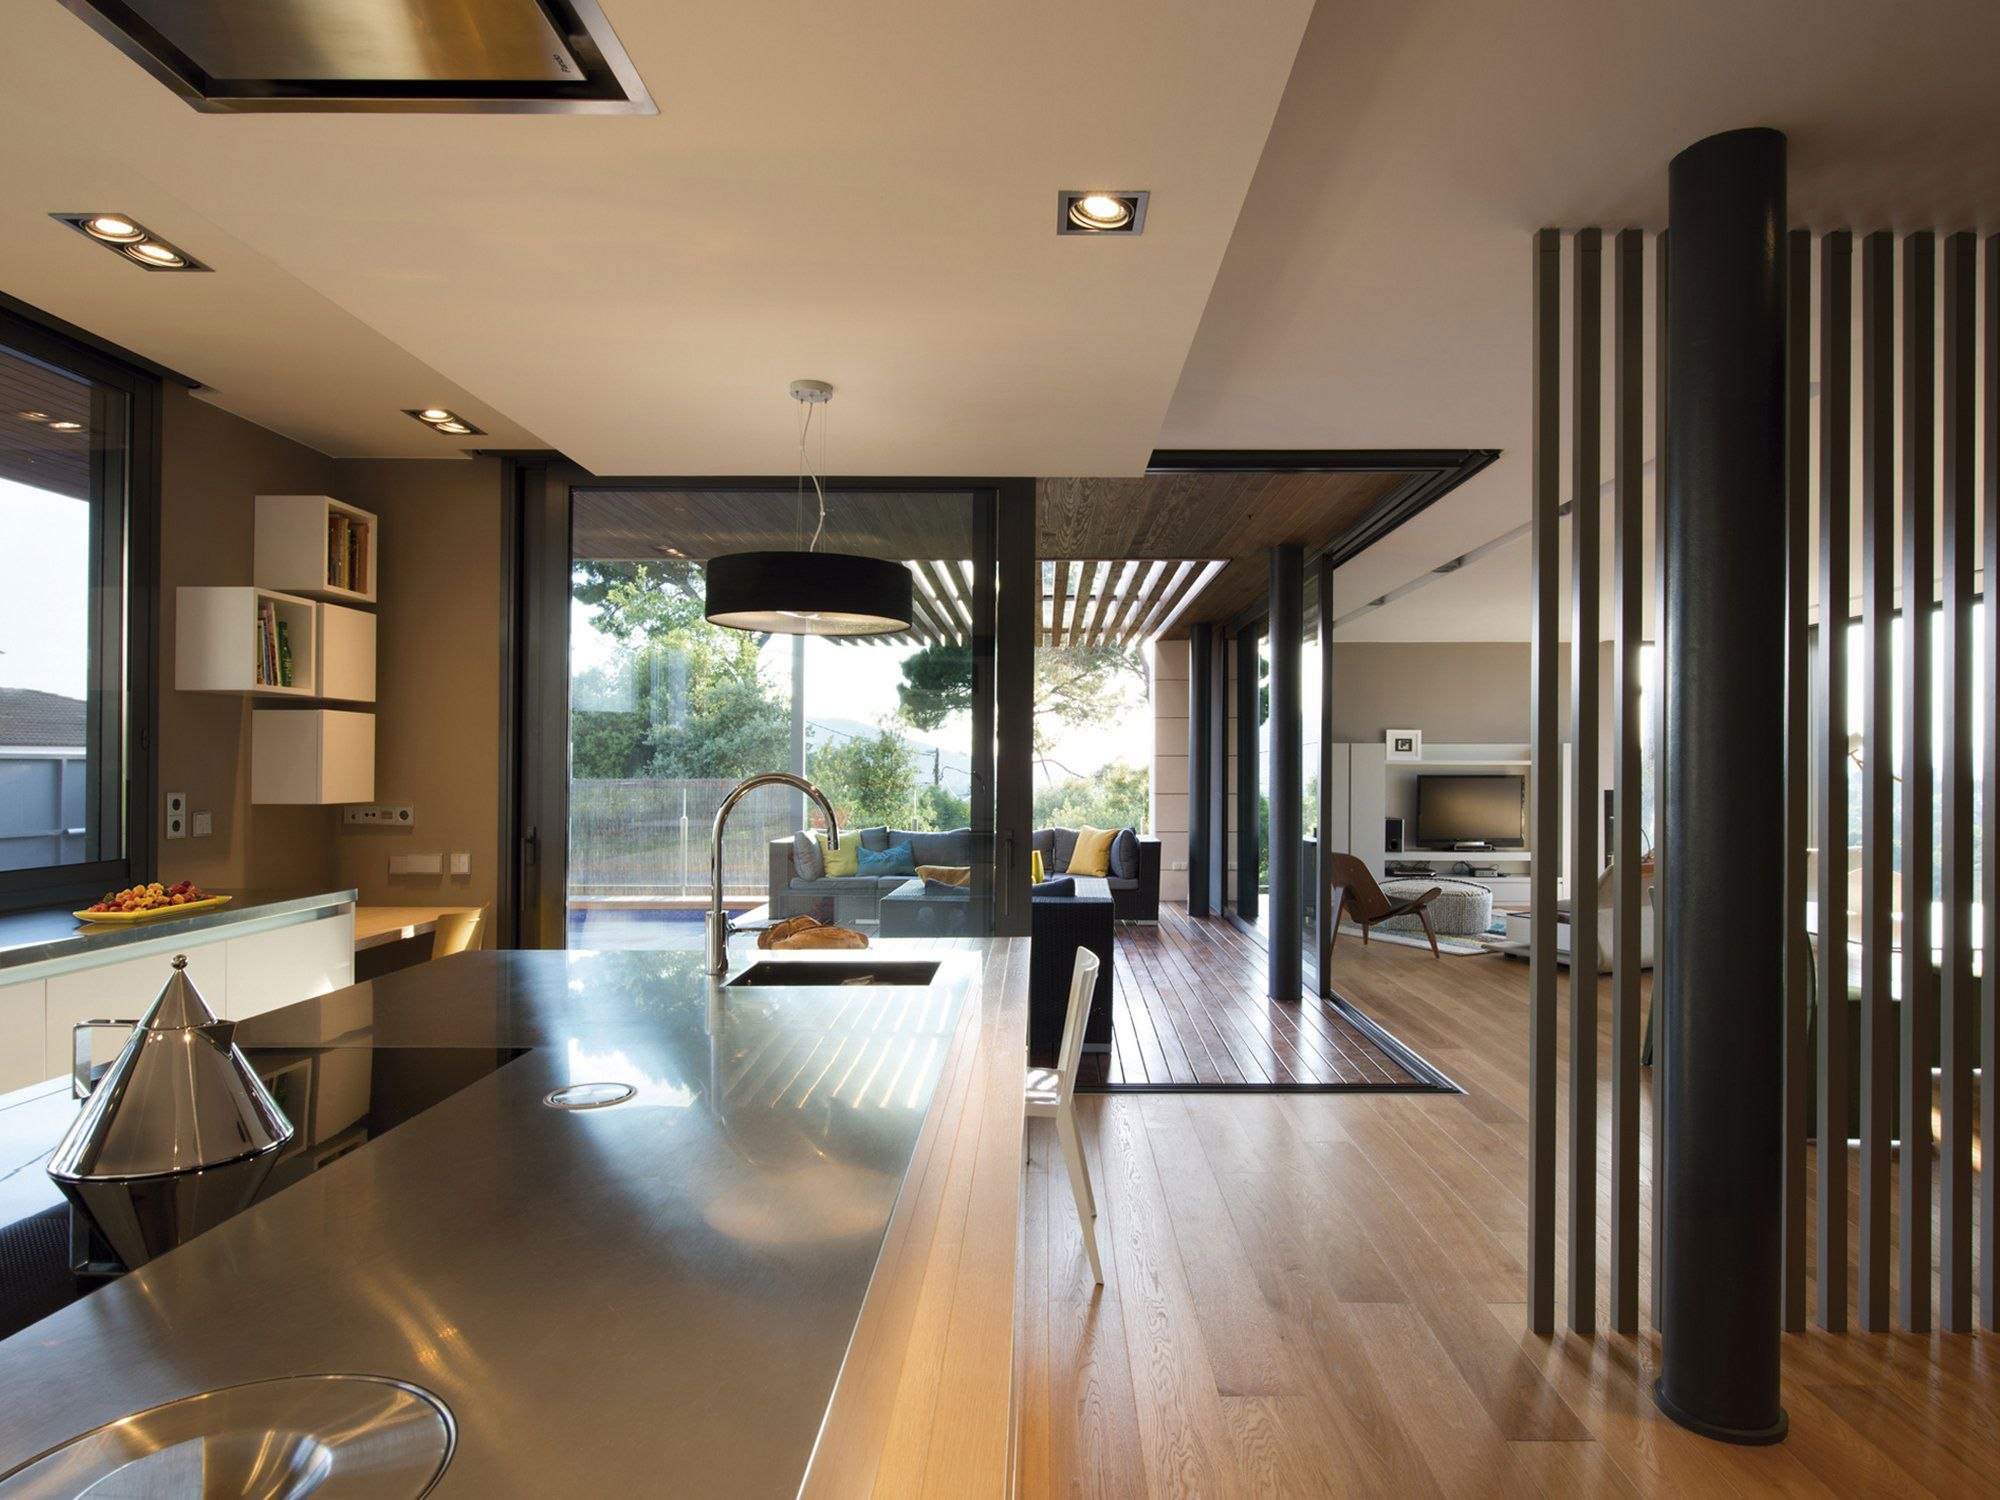 R house by artigas arquitectes caandesign architecture for R house design